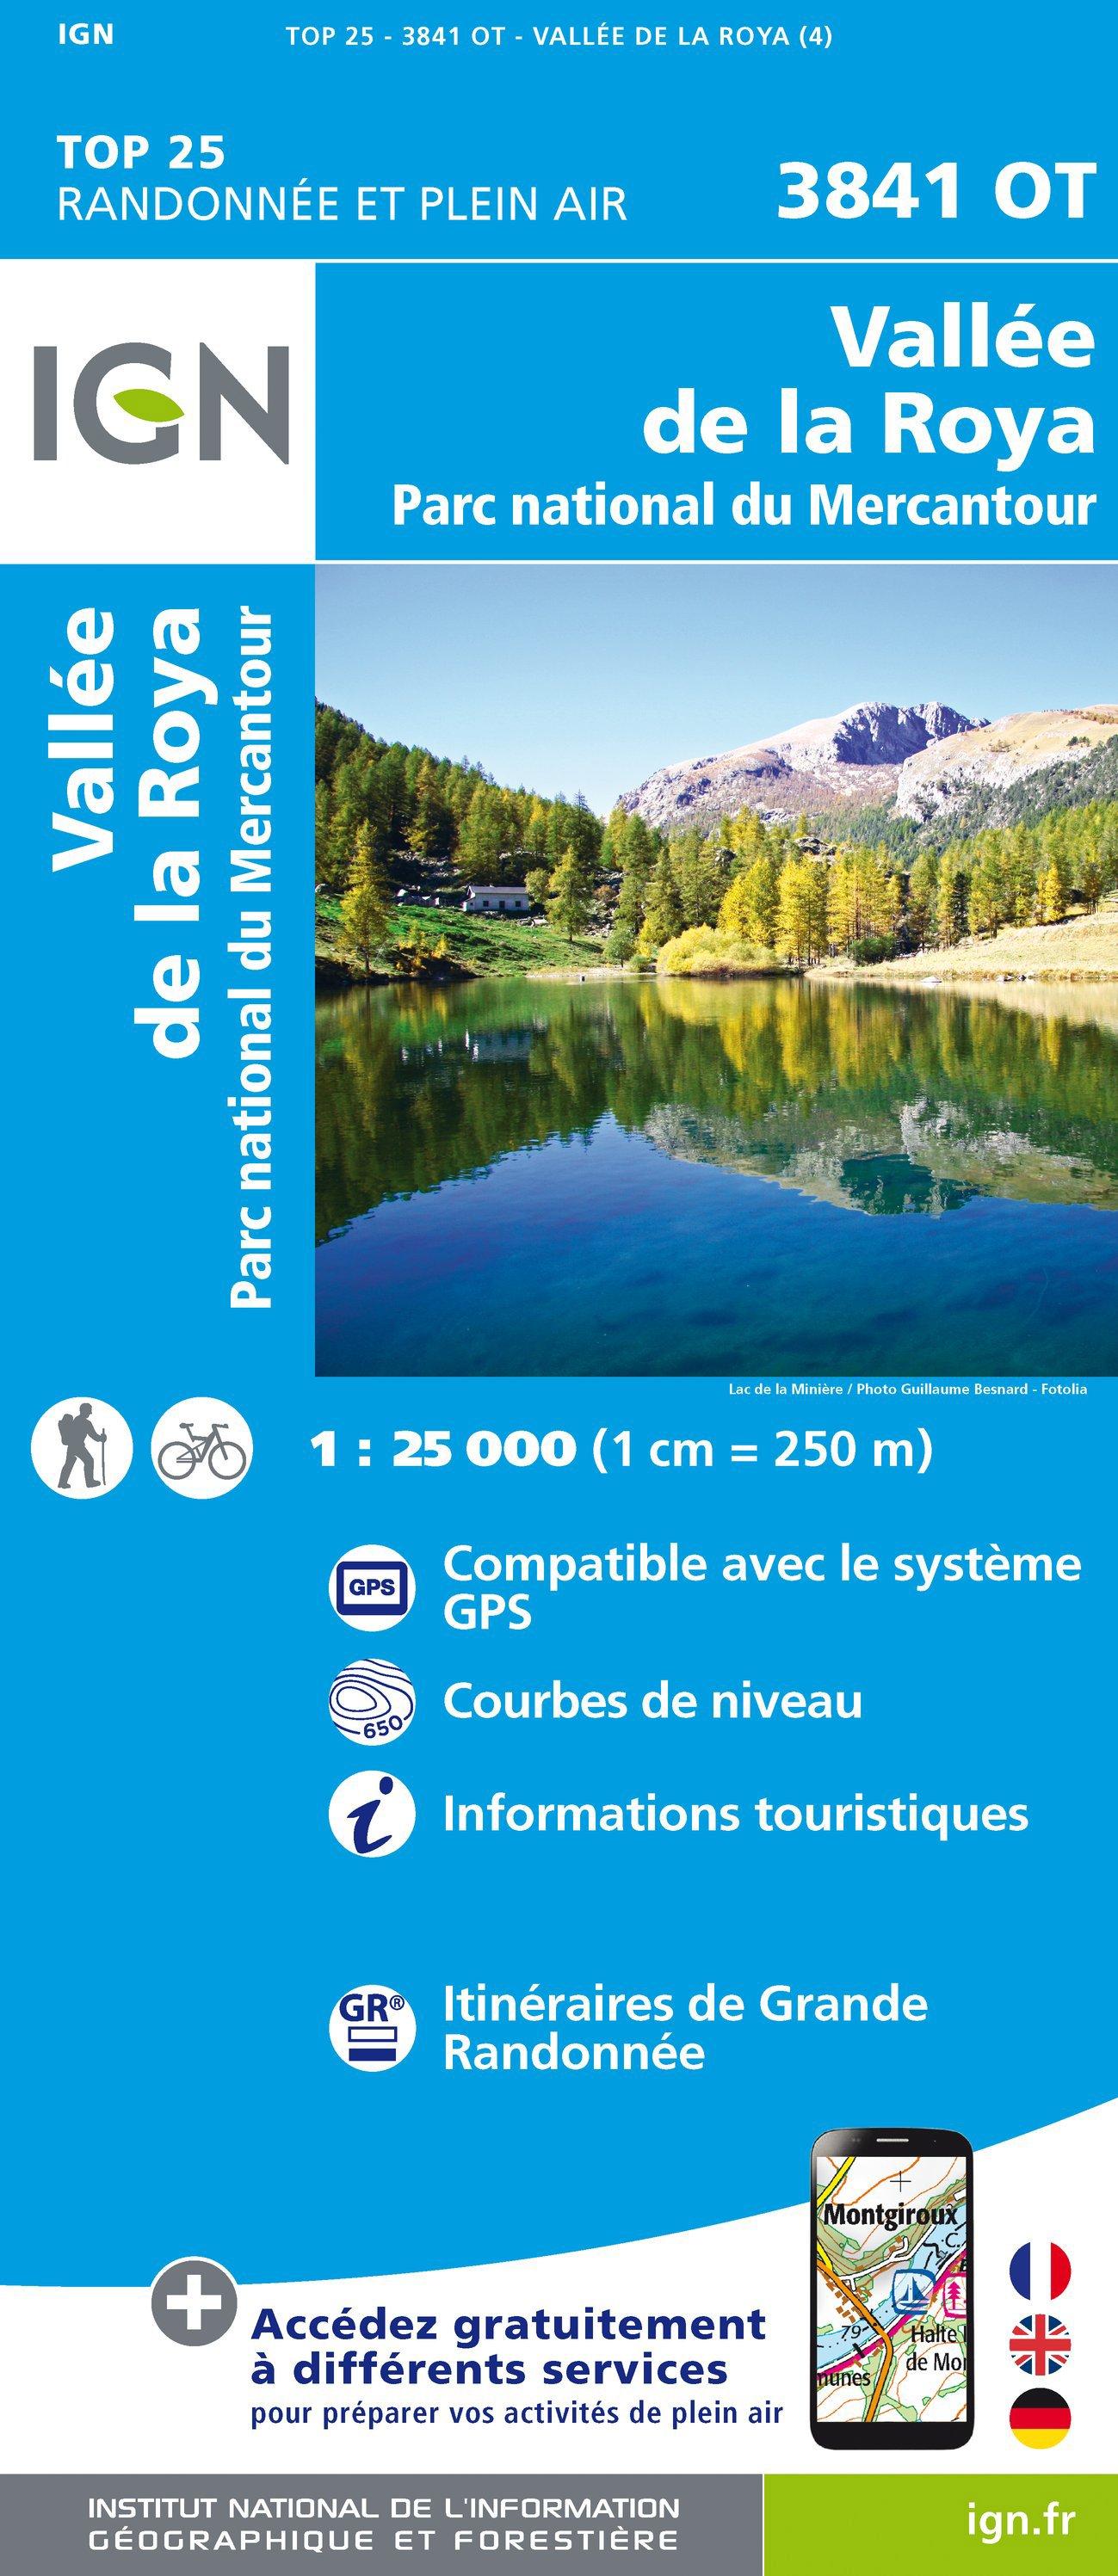 3841OT  Vallée de la Roya | wandelkaart 1:25.000 9782758540397  IGN TOP 25 (1:25.000) Wandelkaarten Franse Alpen  Wandelkaarten tussen Valence, Briançon, Camargue en Nice